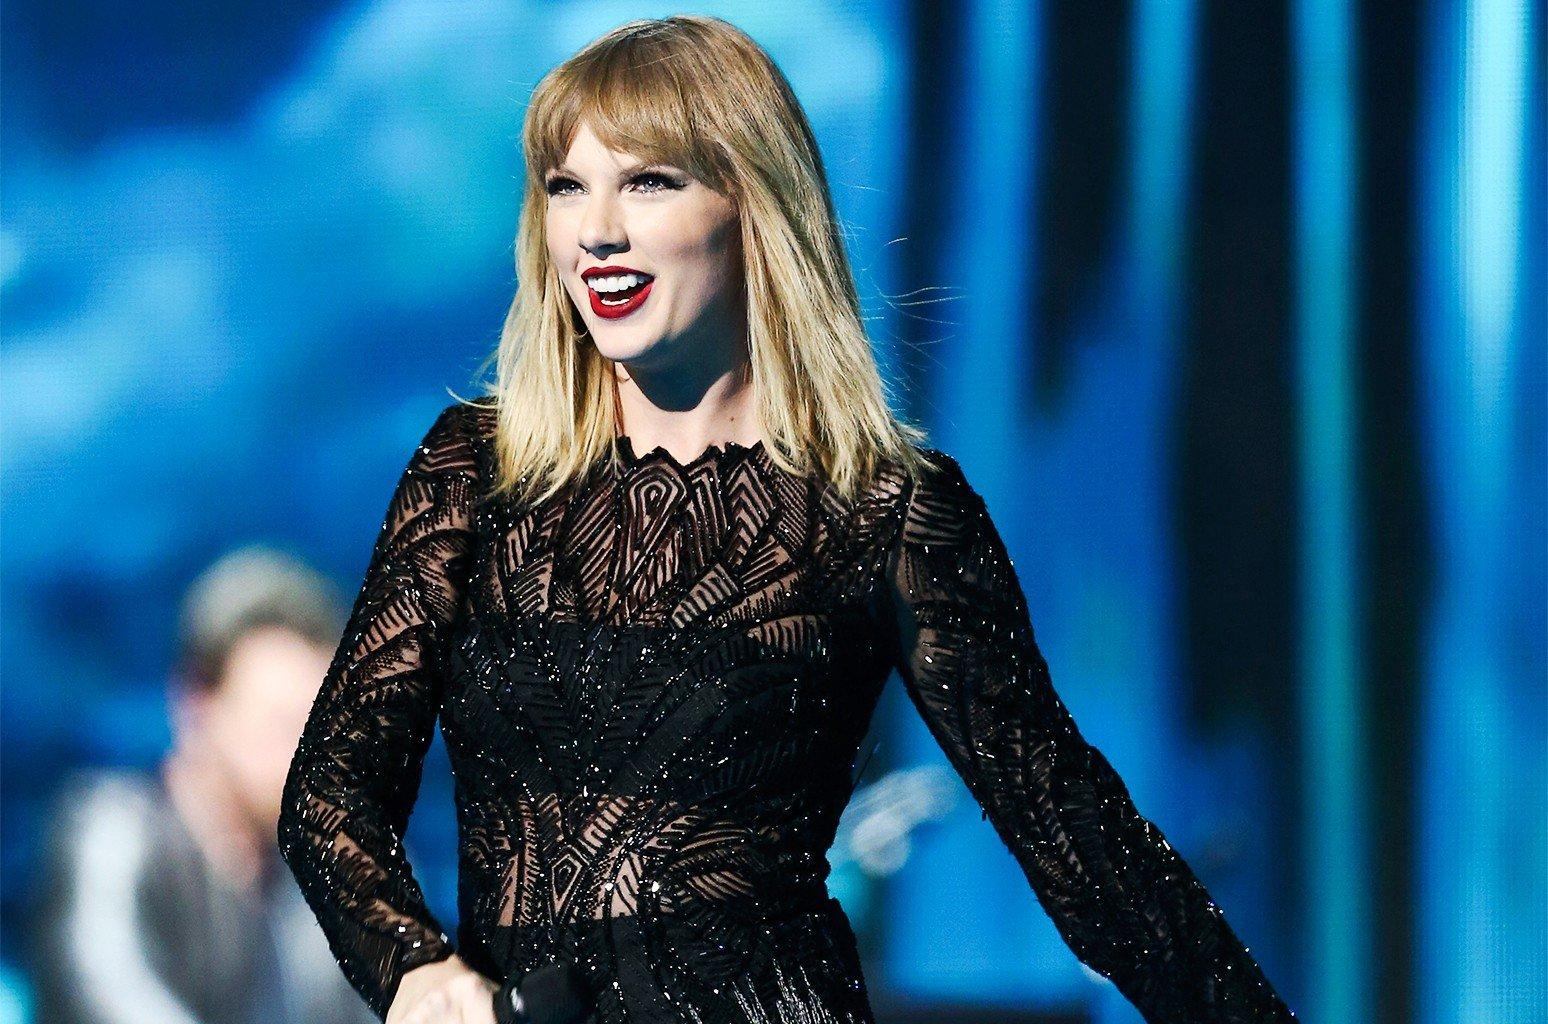 Phan ung bat ngo cua Taylor Swift khi bi cho la 'nham' vi toan viet nhac noi den trai hinh anh 2